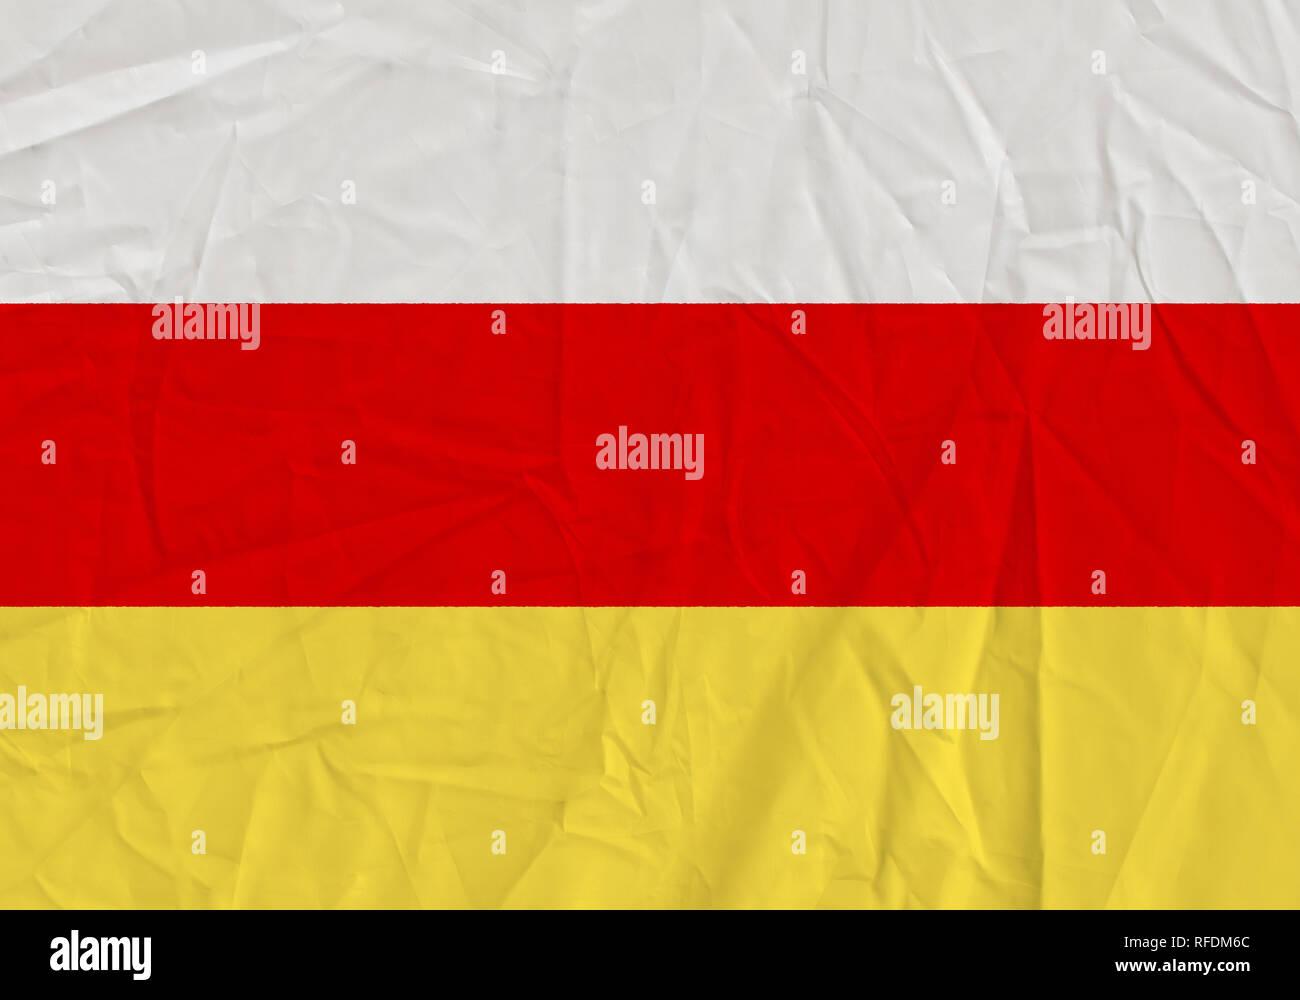 South ossetia grunge flag. Patriotic background. National flag of South ossetia - Stock Image